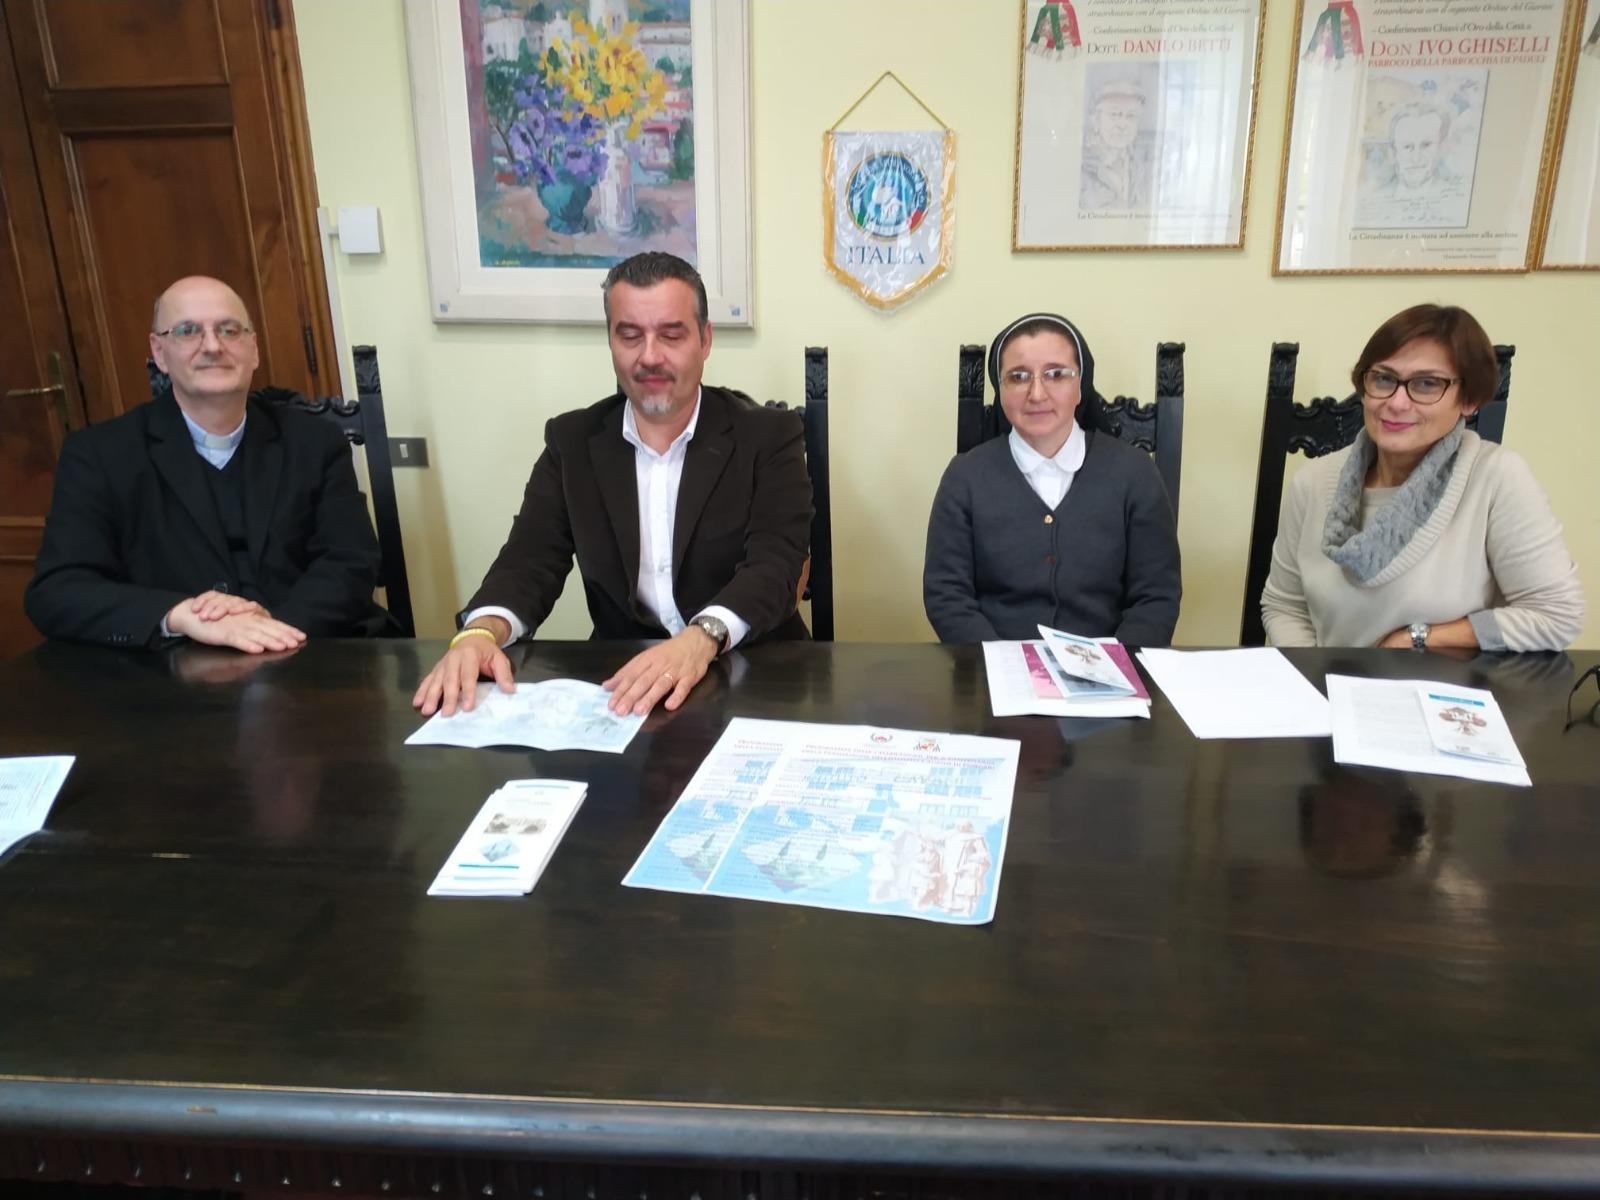 Marsili Fornaciari Lourdes Rimanti